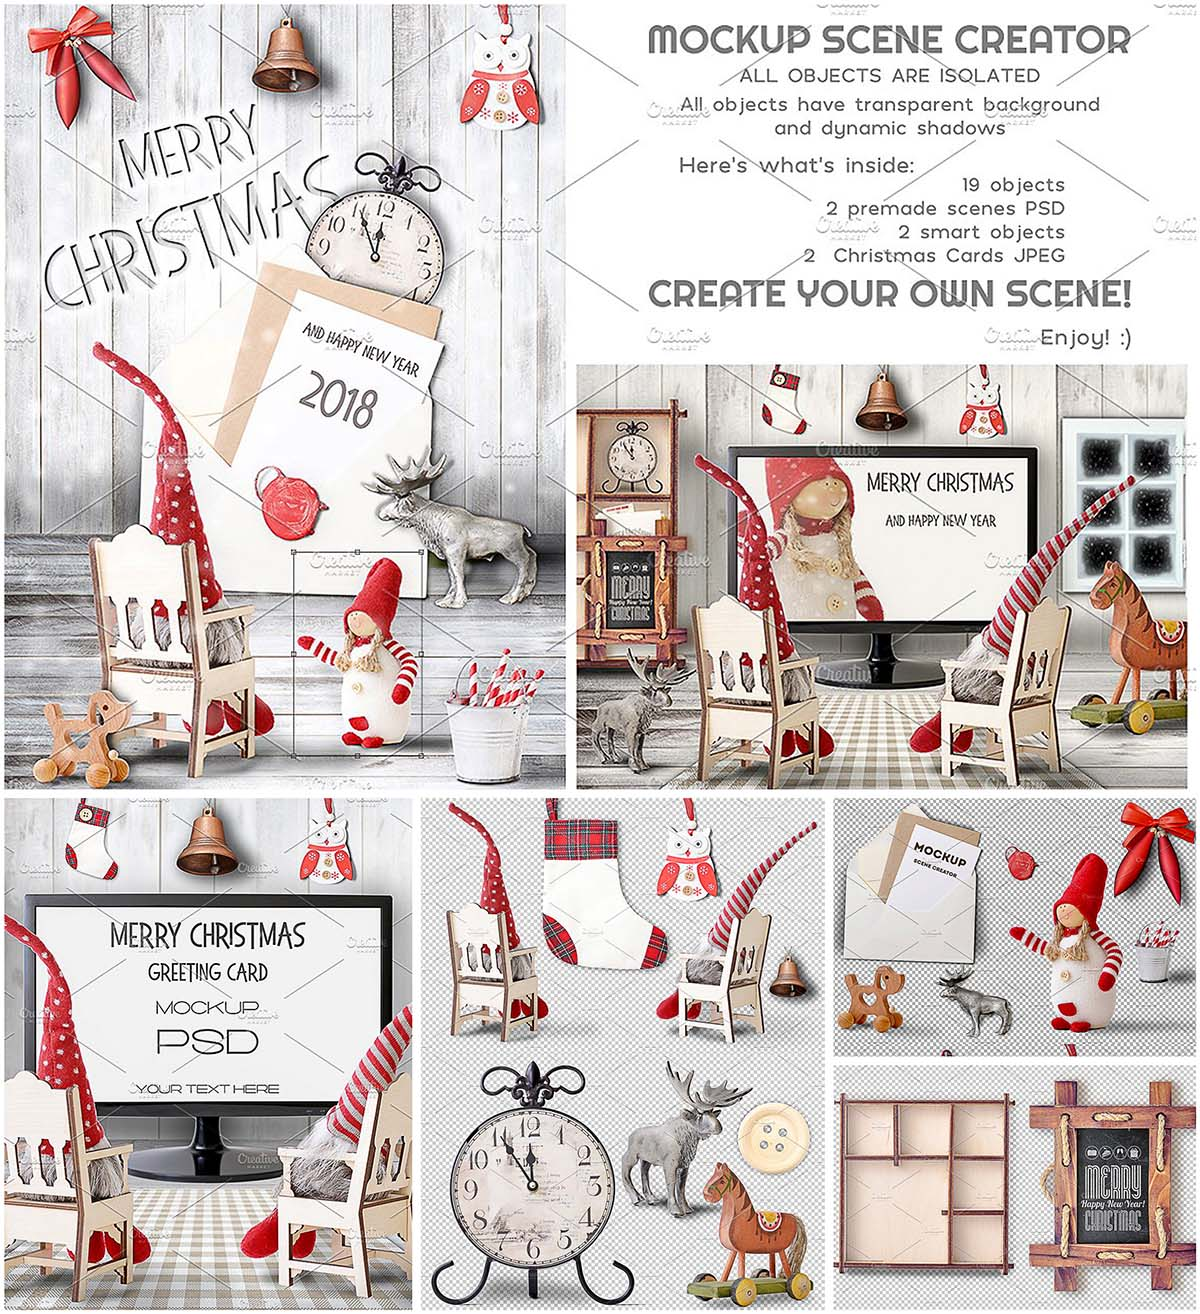 Christmas Mockup Scene Creator Free Download